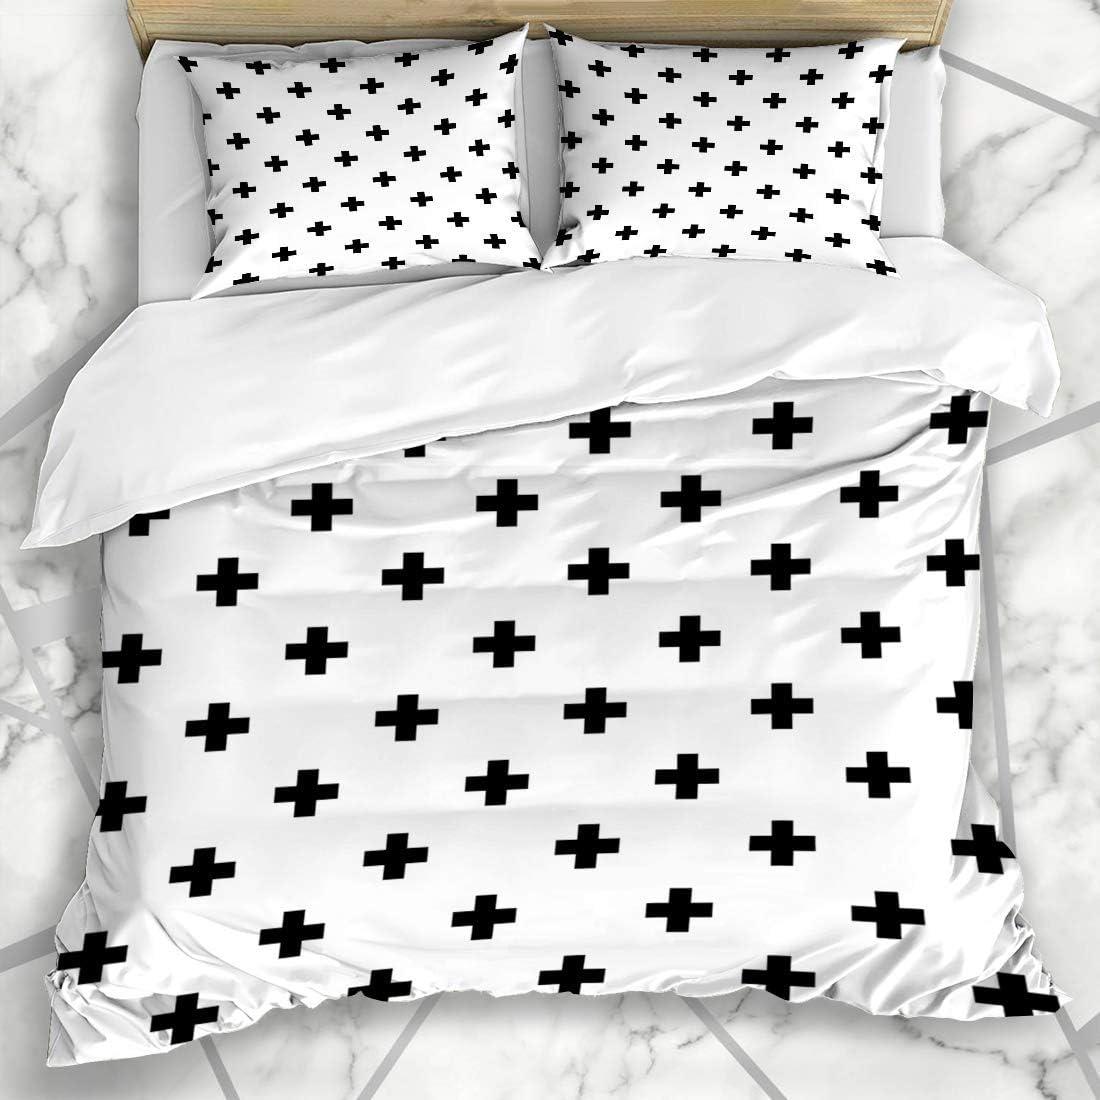 Soefipok Duvet Cover Sets Switzerland Swiss Crosses Pattern Cross Monochrome Abstract Plus Black Geometric Contemporary Microfiber Bedding With 2 Pillow Shams Amazon Co Uk Kitchen Home